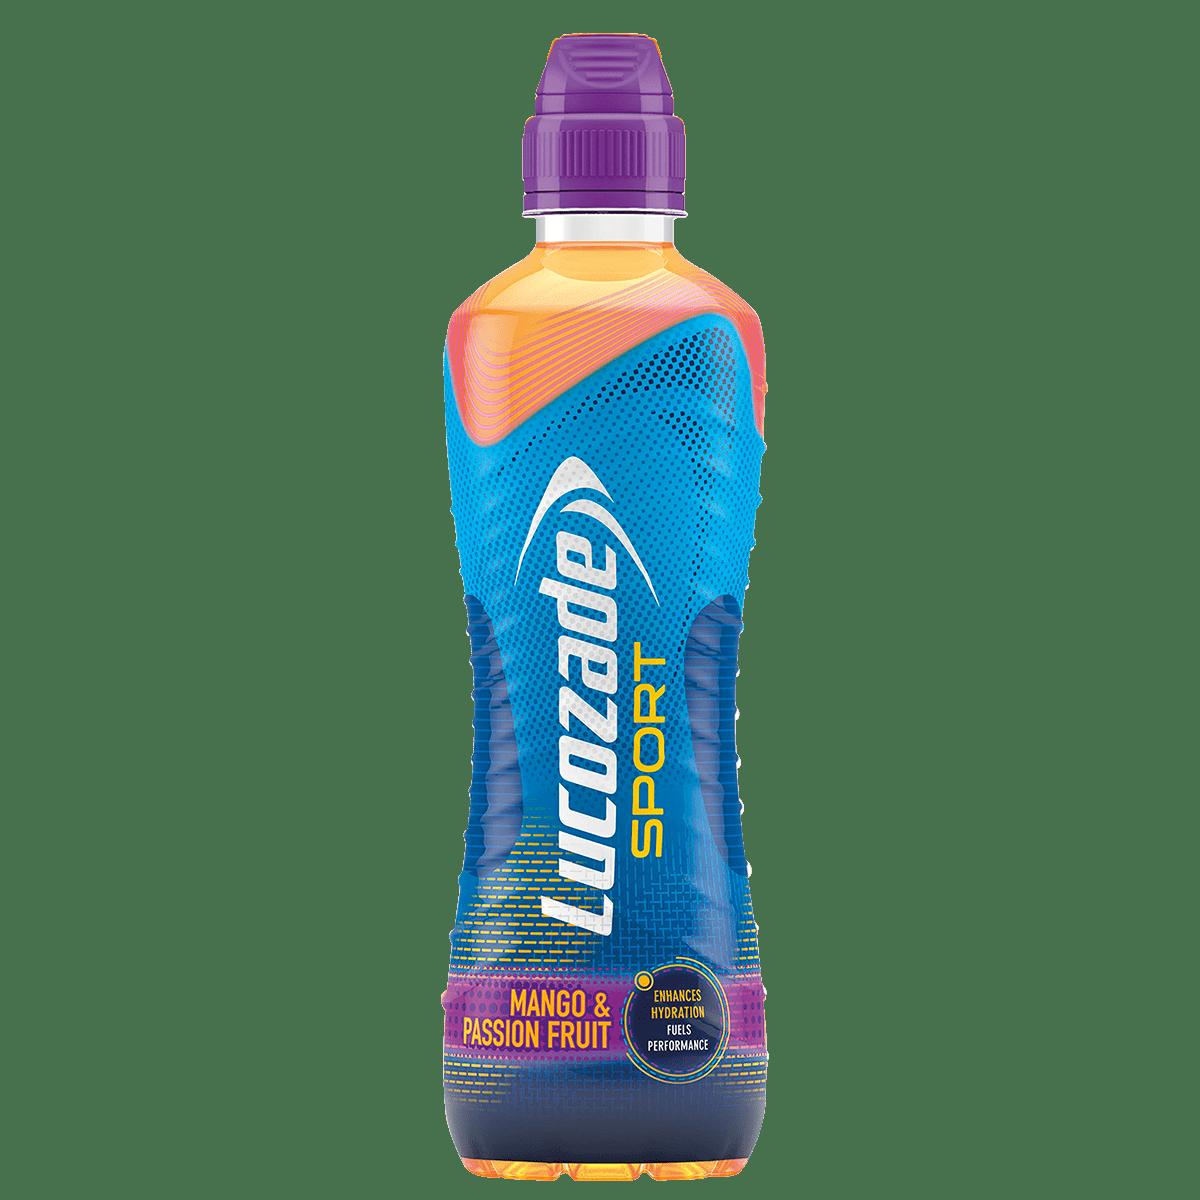 Lucozade Sport - Mango & Passion Fruit